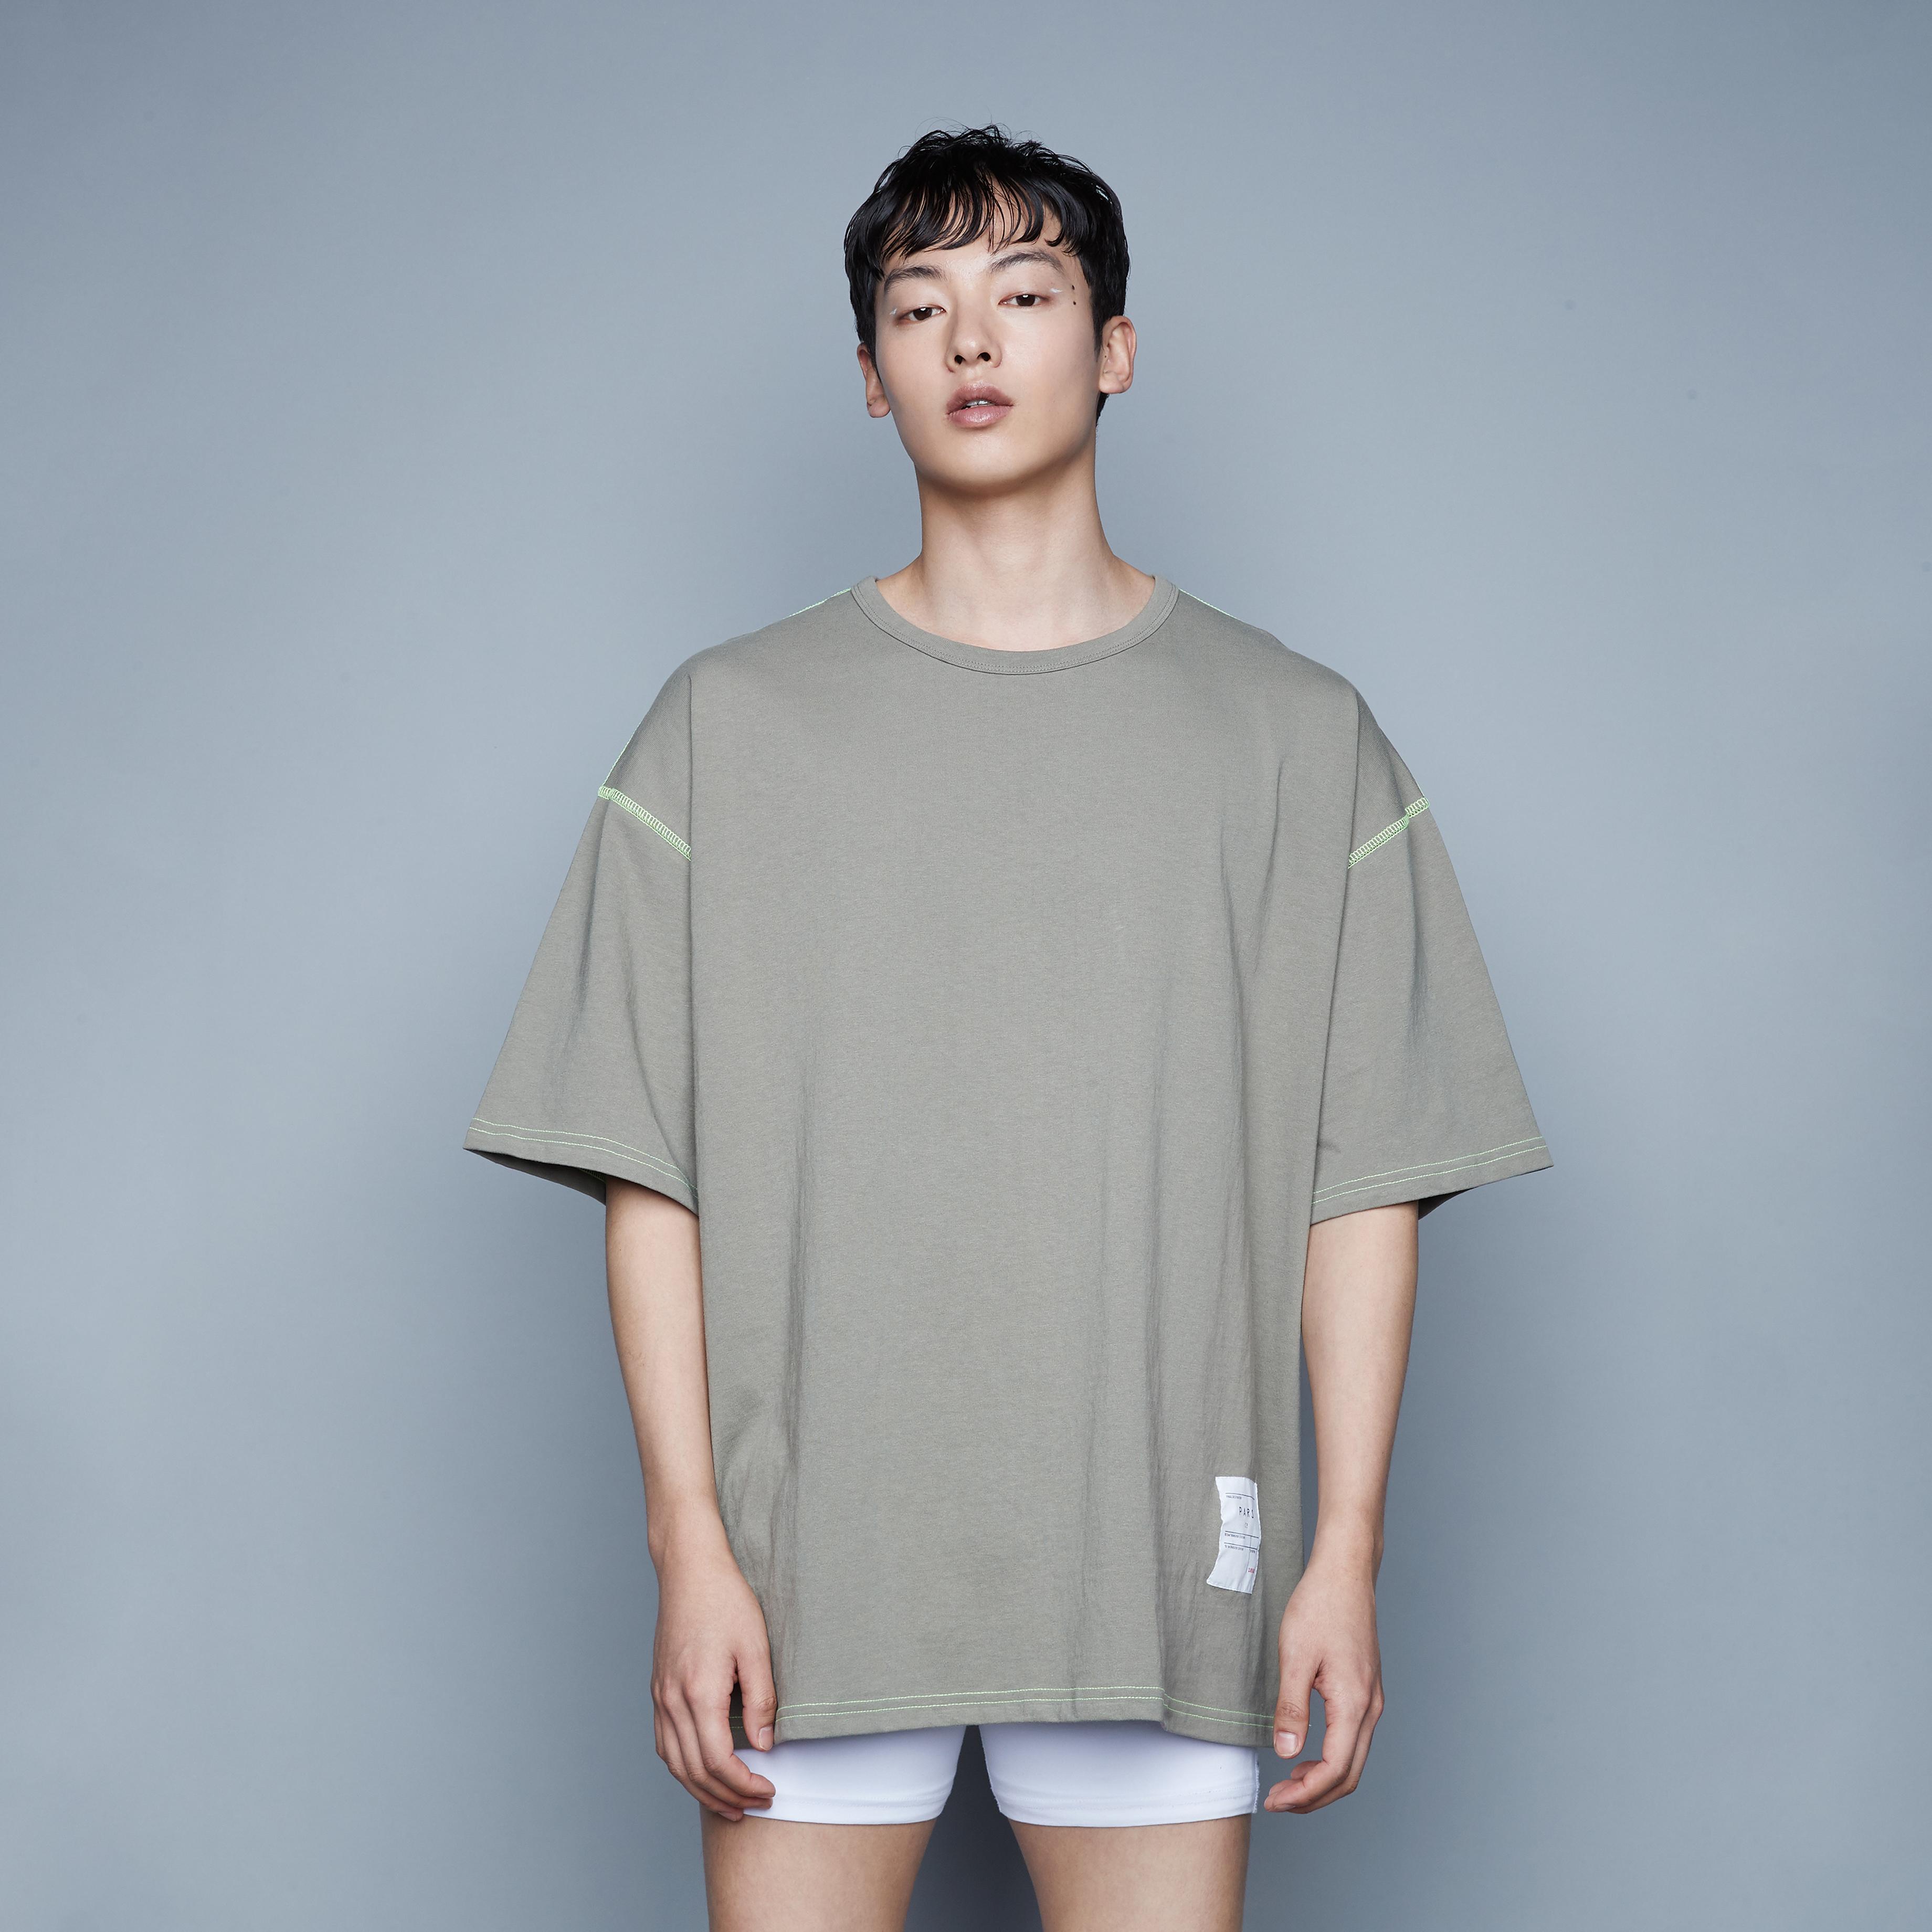 Pars A Grenoble Khaki Over Short T-Shirt(빠흐아그레노블카키오버반팔티)